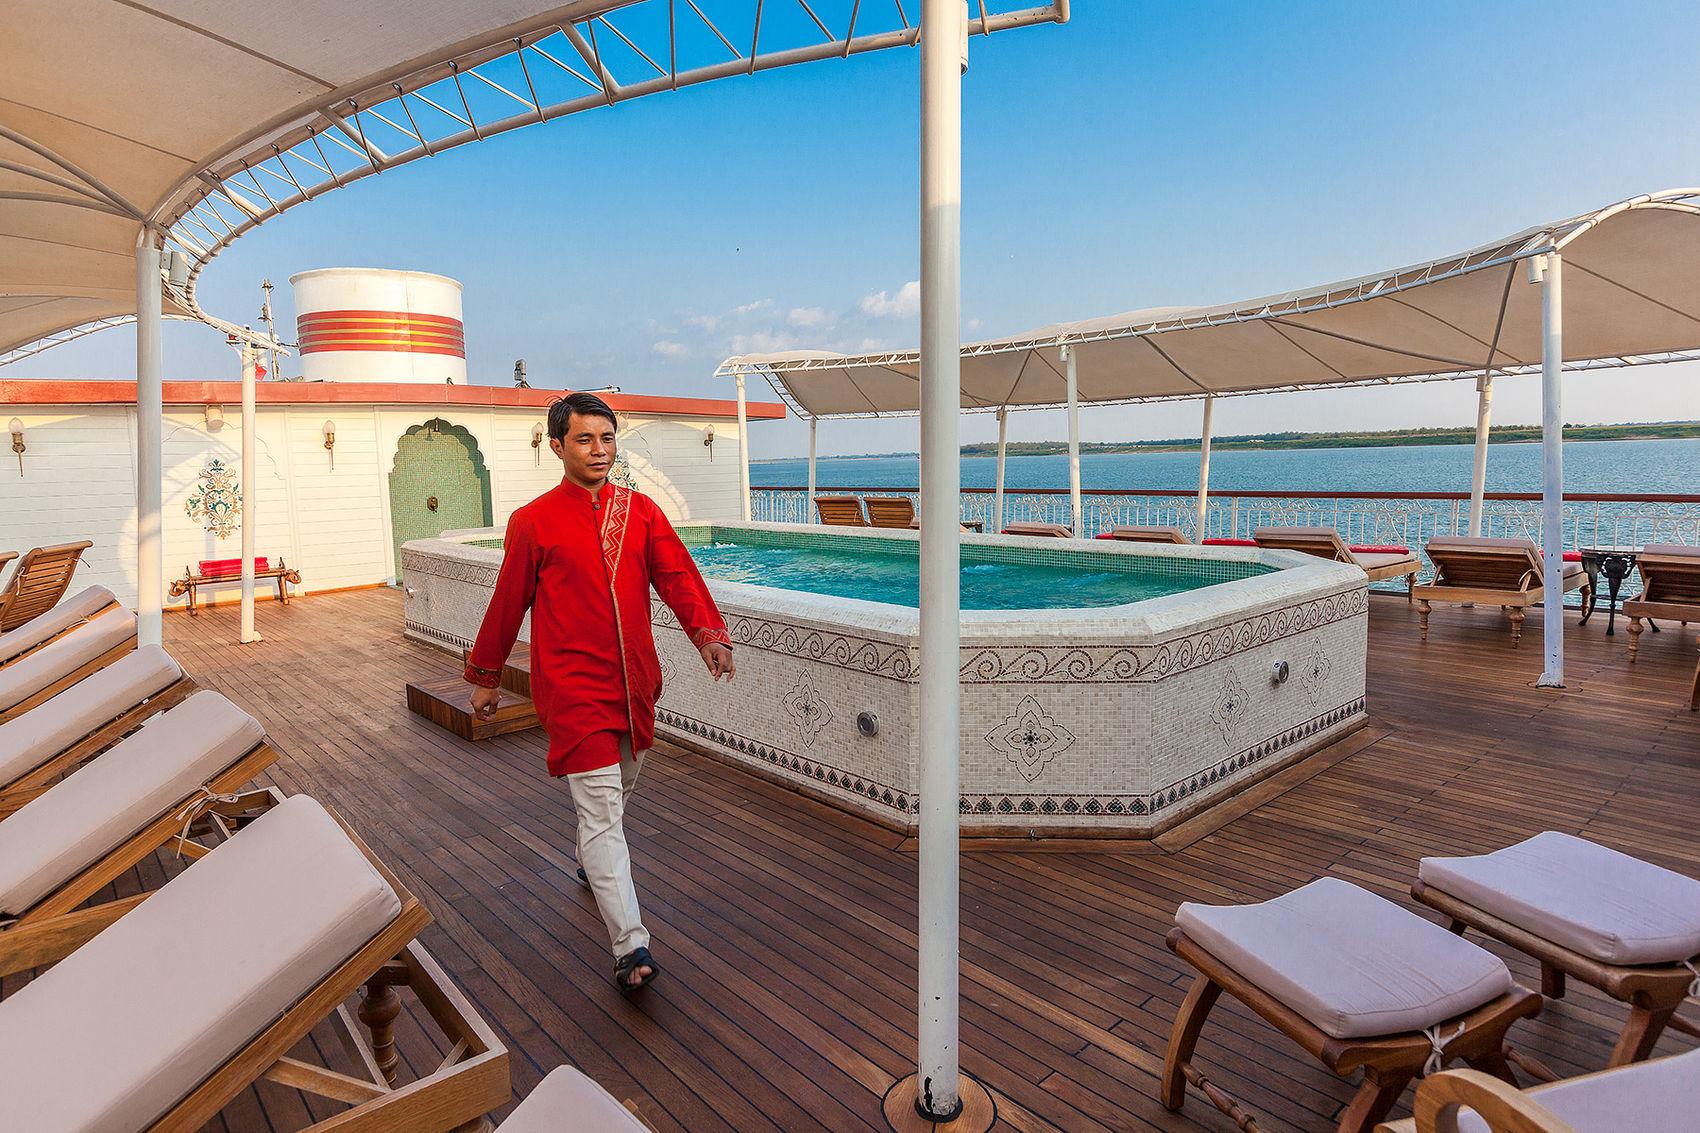 Pool and sun deck